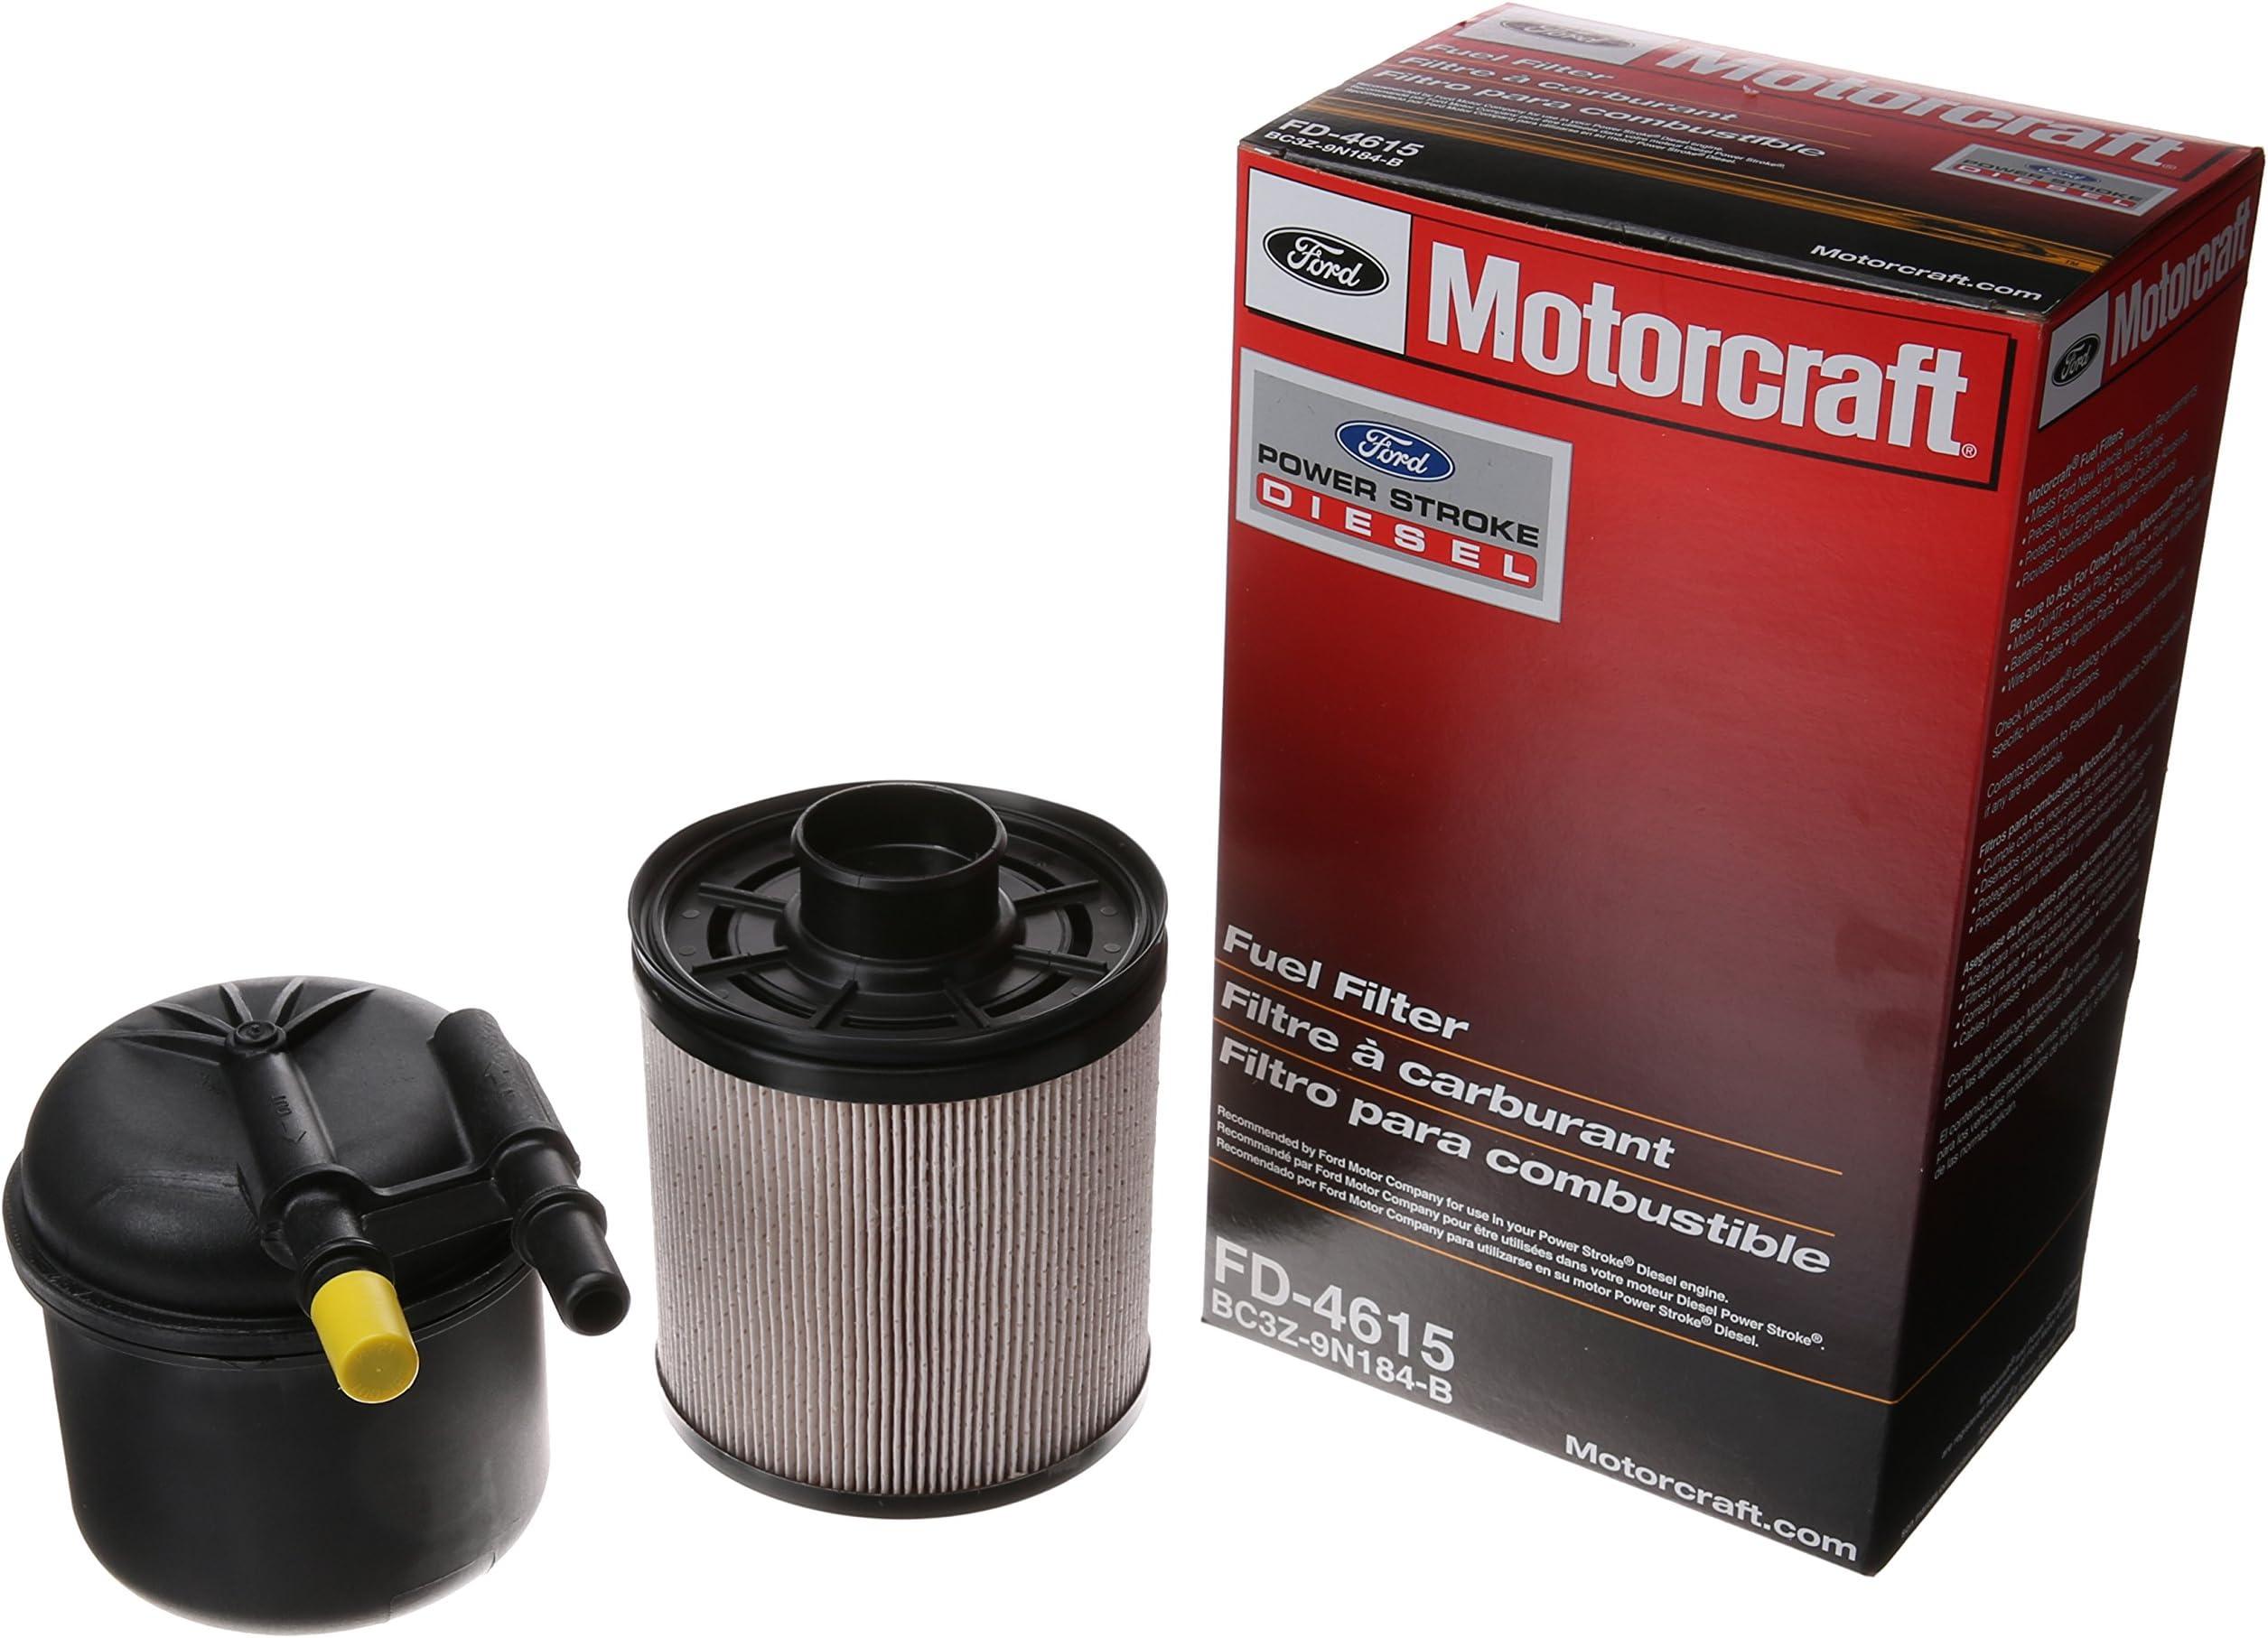 amazon com fuel filters replacement parts automotive  motorcraft fd 4615 fuel filter